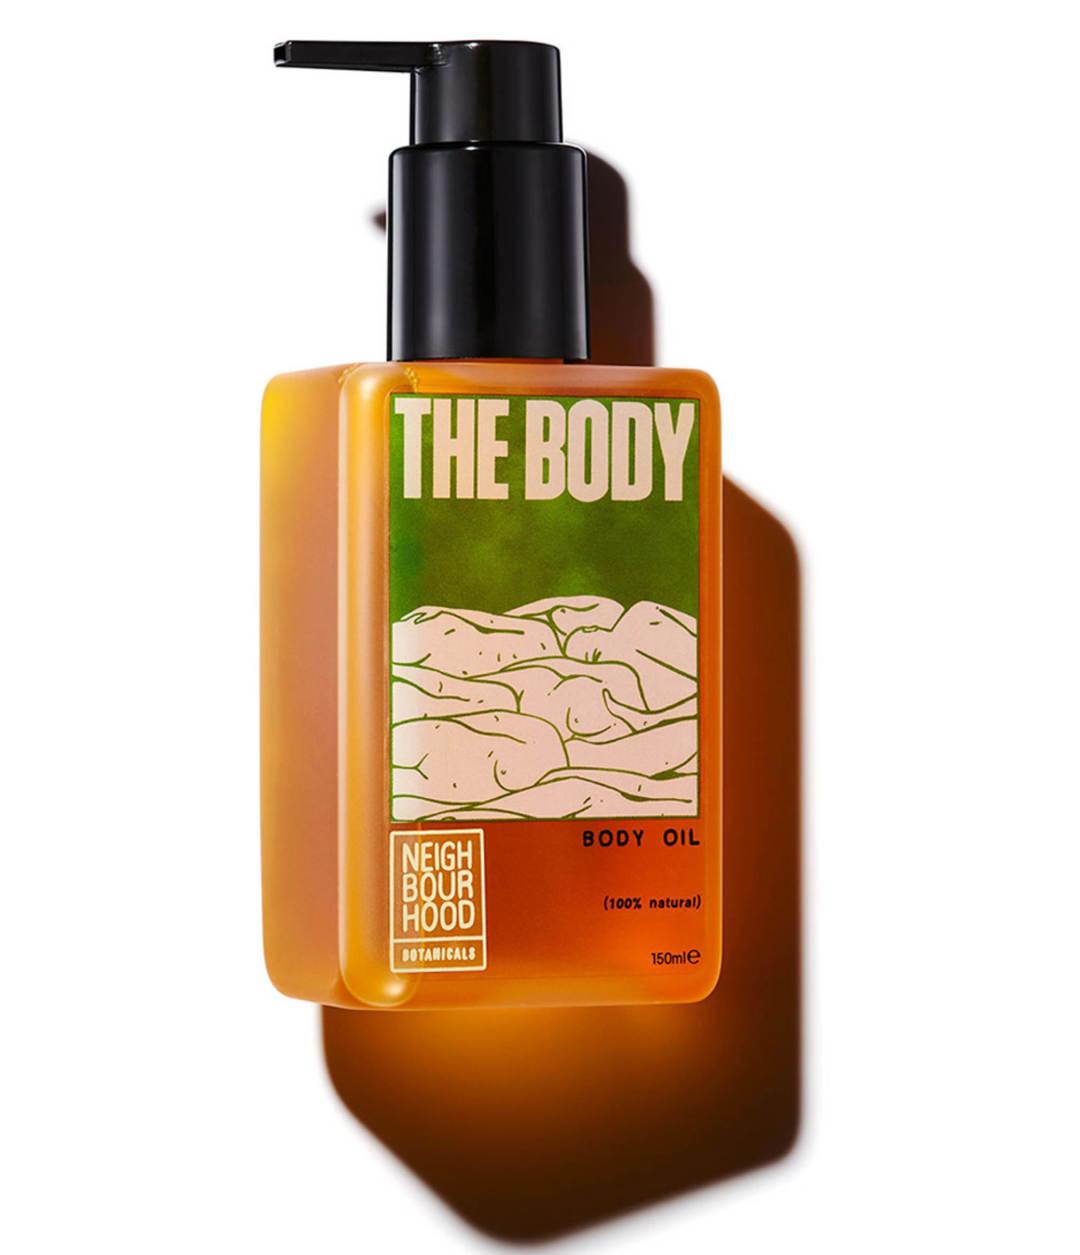 The-Body---Neighbourhood-Botanicals